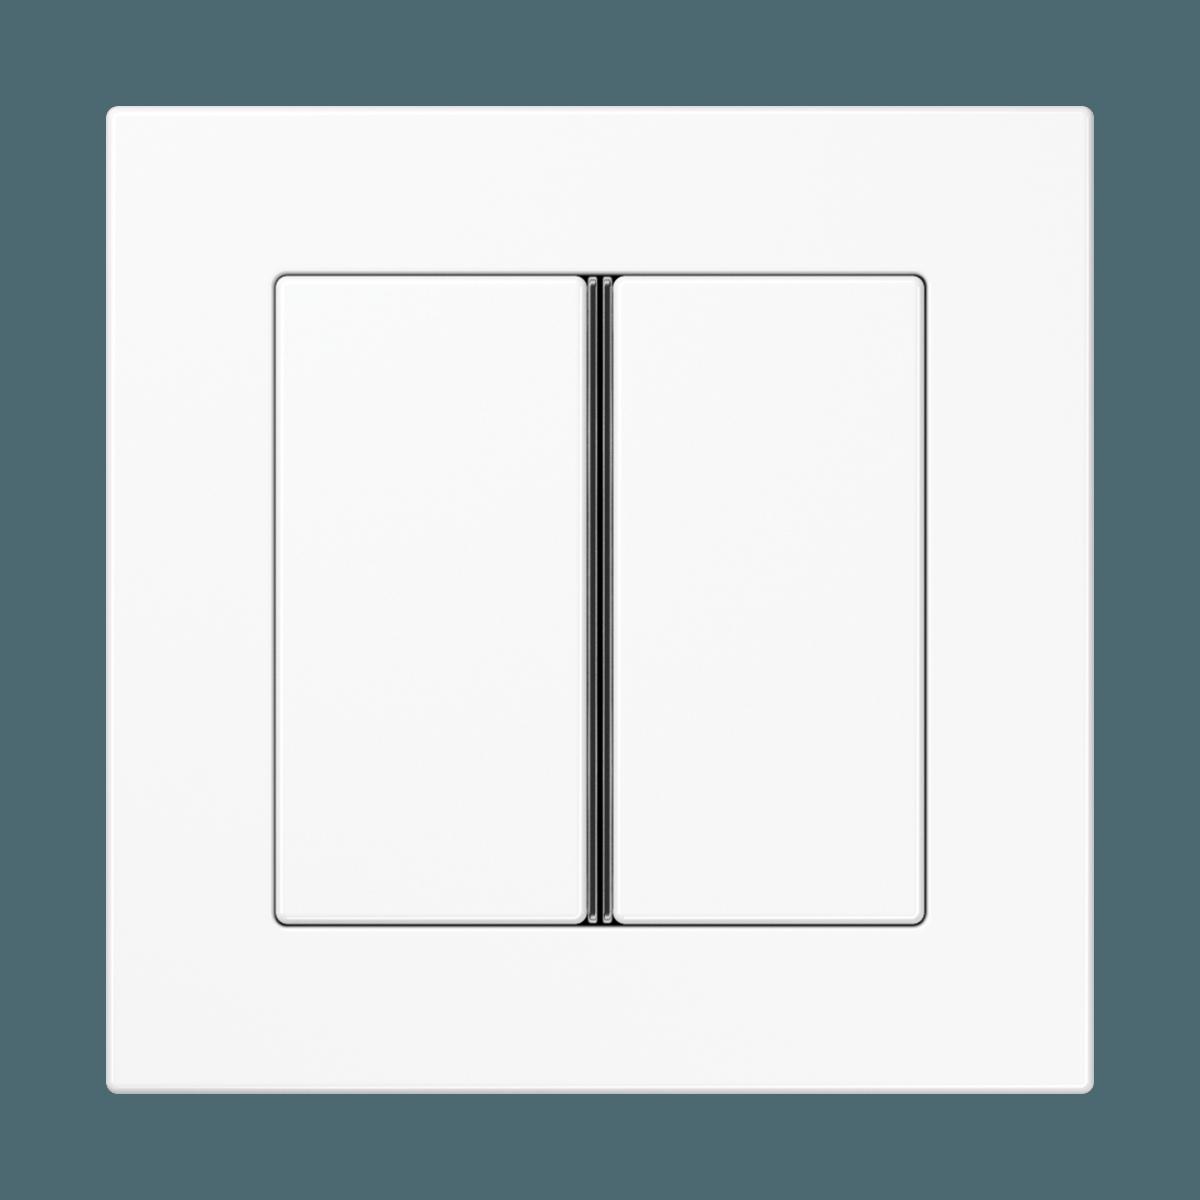 Variasi A 550 White Series  LightingInterior LightingLighting Components 9